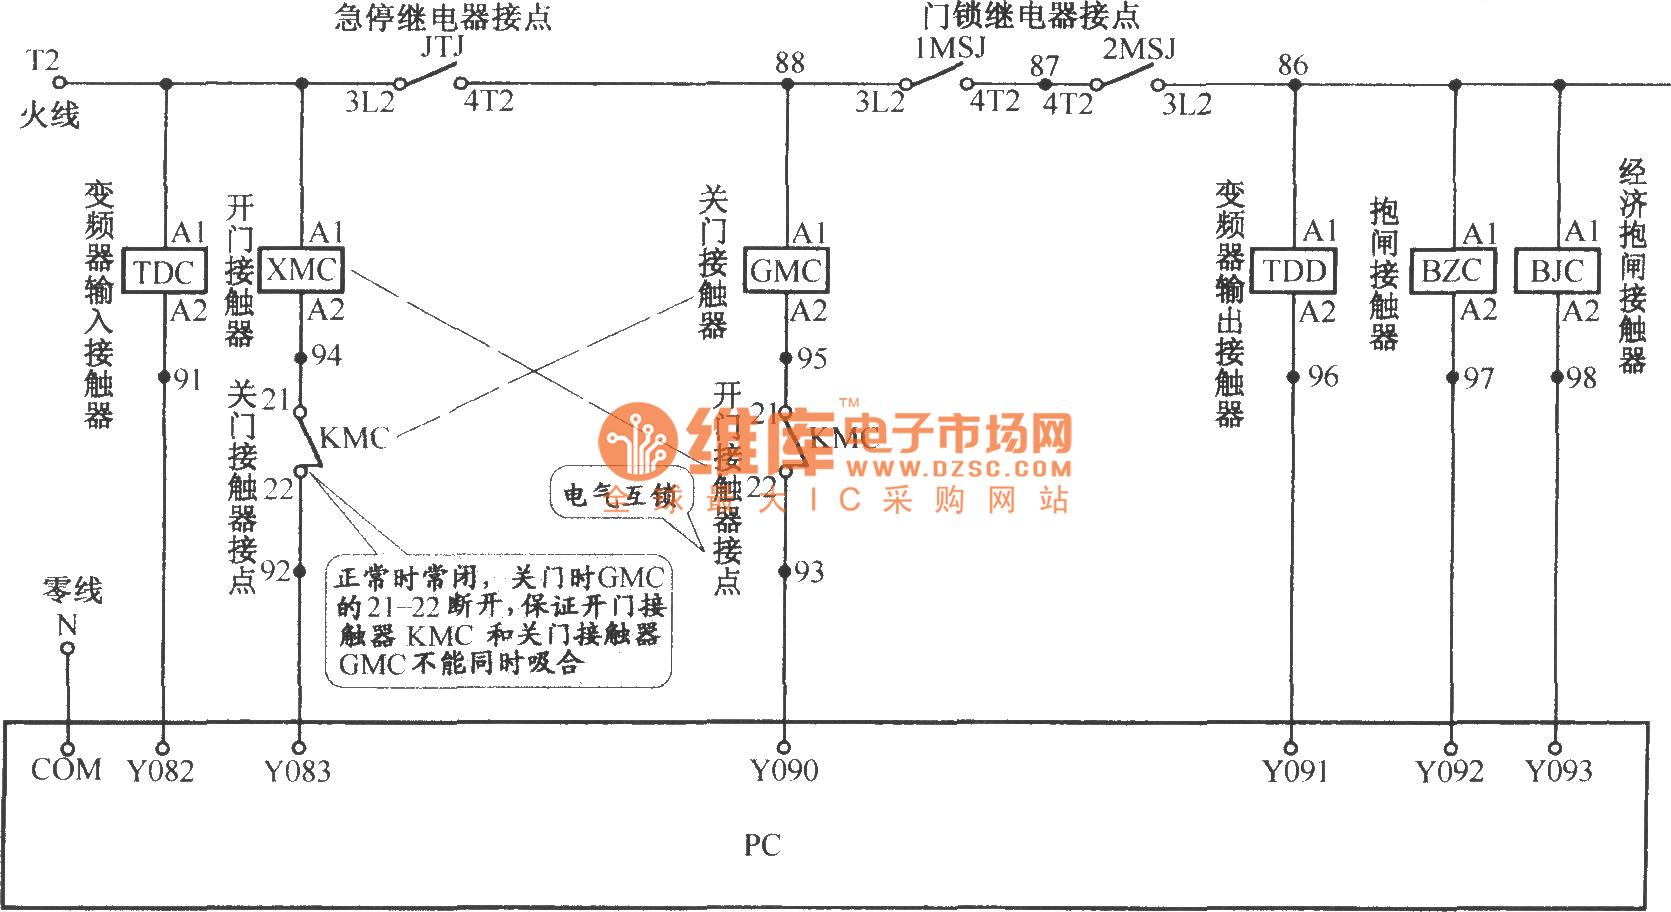 photoelectricacpowerswitch switchcontrol controlcircuit autowiringcircuitdiagram controlcircuit beijingtujiecontactorwiringcircuit